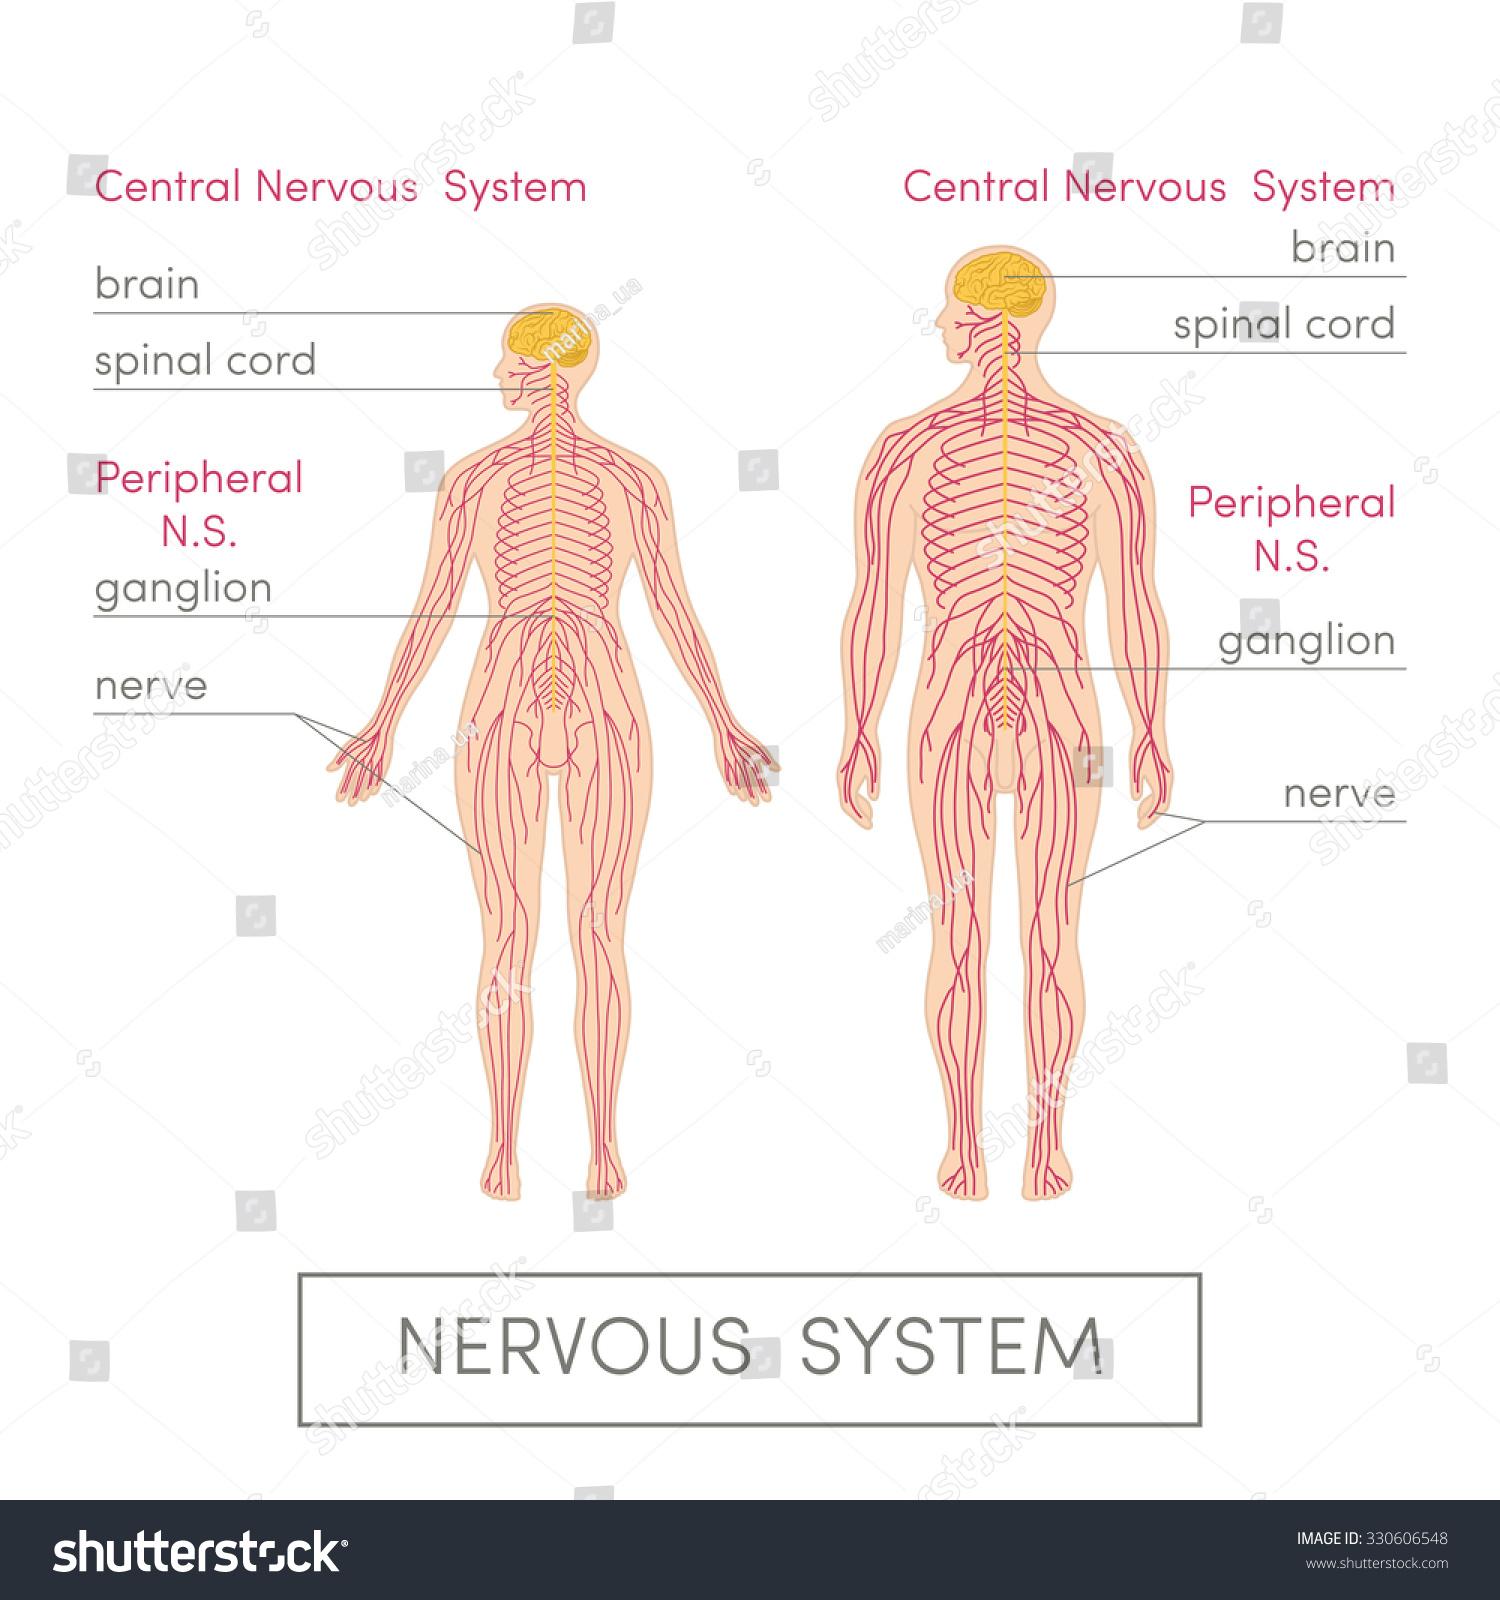 Nervous System Human Cartoon Vector Illustration Stock Vector ...